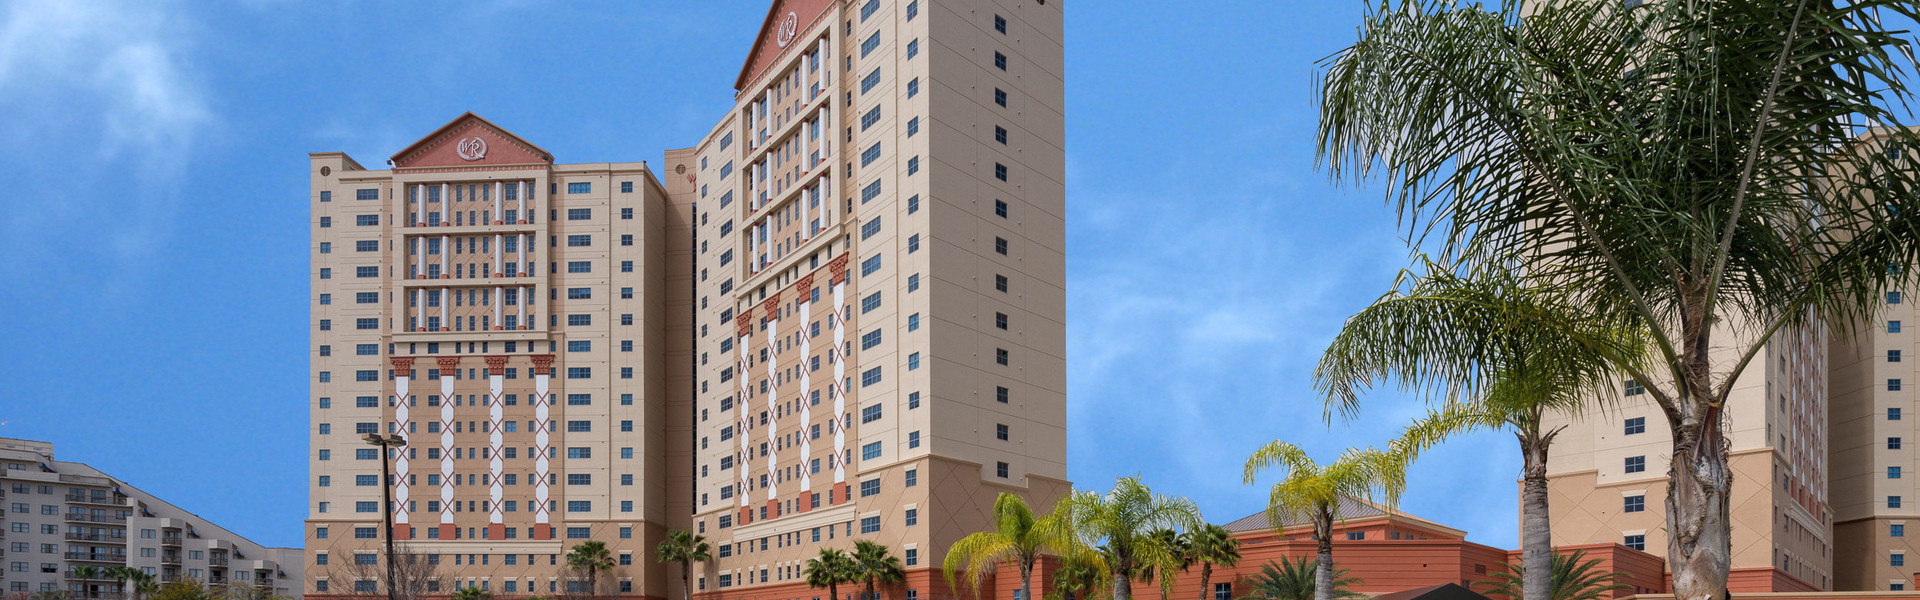 Westgate Palace Resort Overview in Orlando Florida   Resorts Near I Drive Orlando, FL   Westgate Palace Resort Near 32819